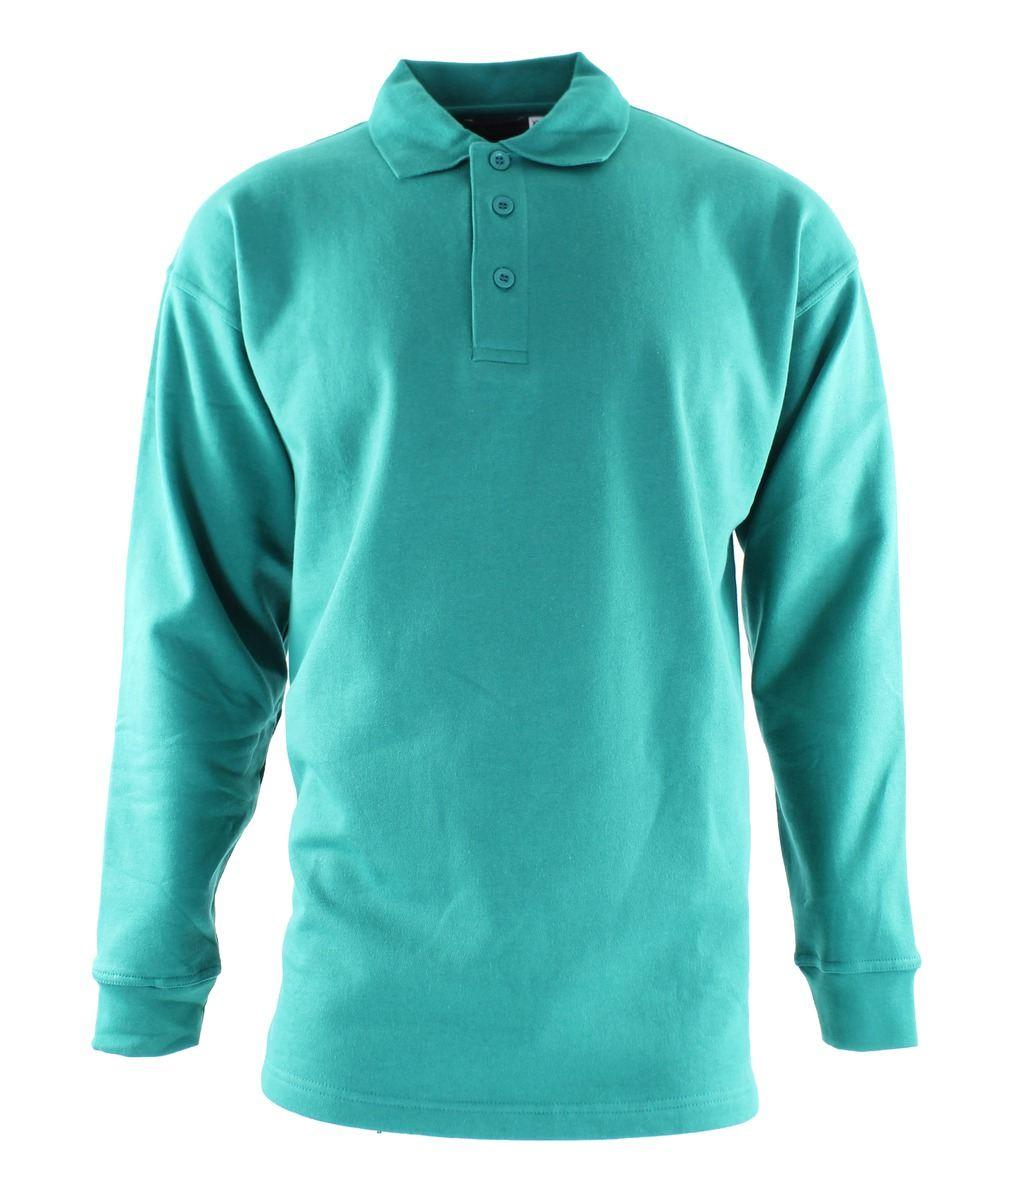 ERIC Polosweater